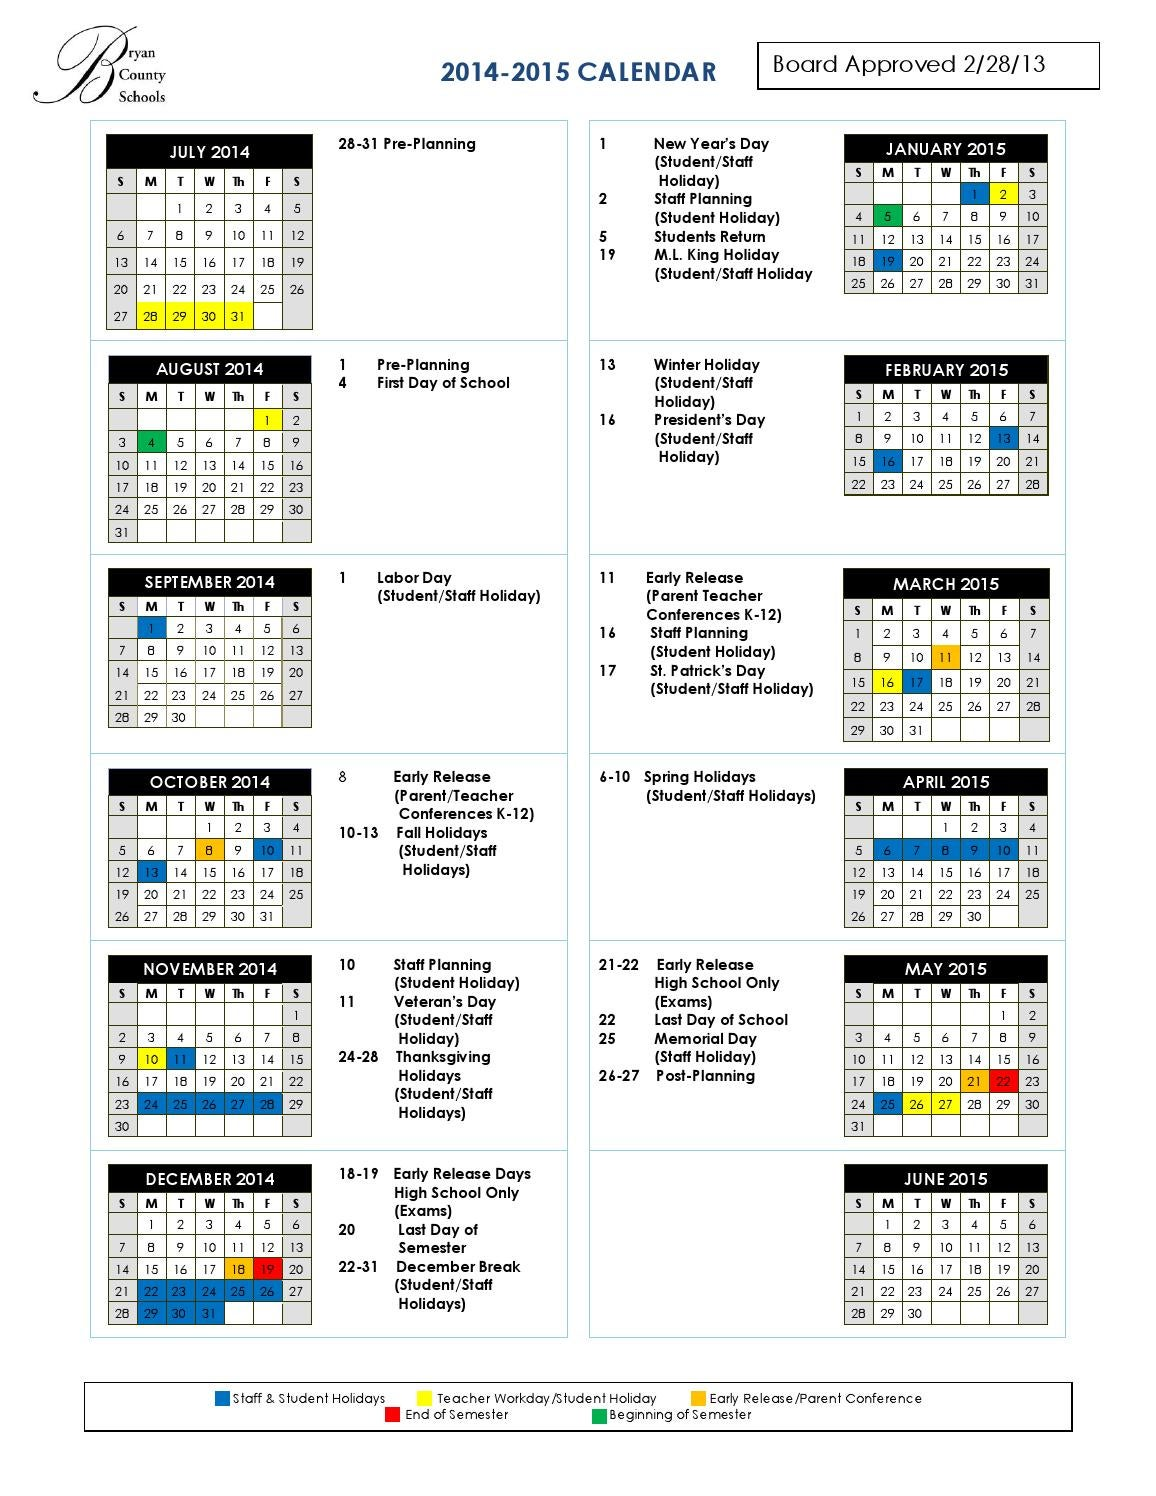 Bryan County Schools 2014 2015 by 1-3 ARB / 3-17 CAV FRSA